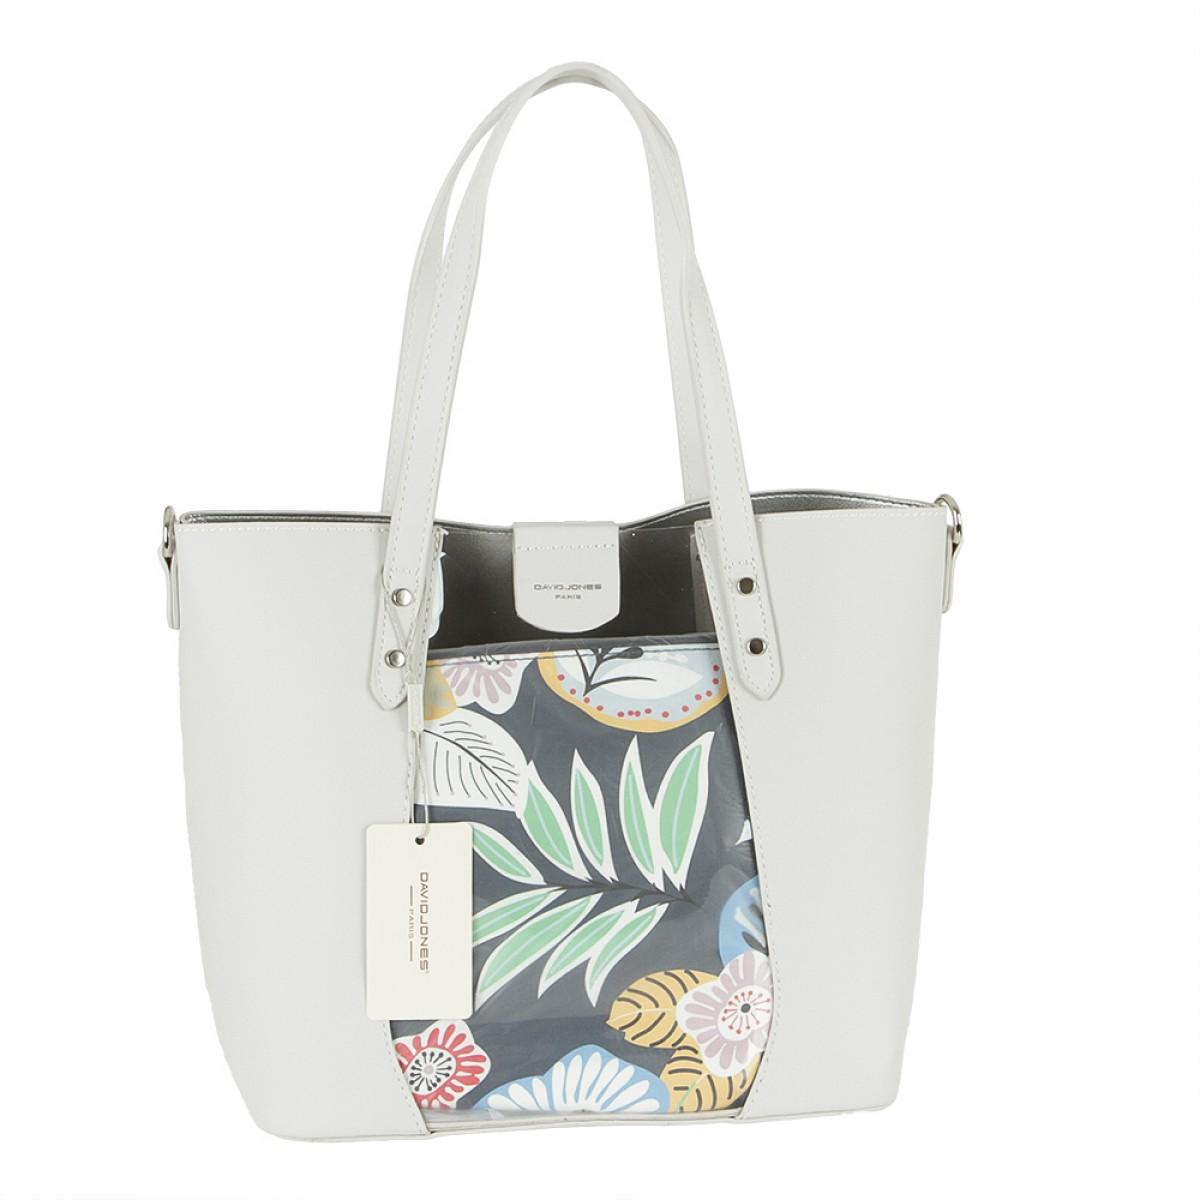 Жіноча сумка David Jones 6245-2 CREAMY WHITE